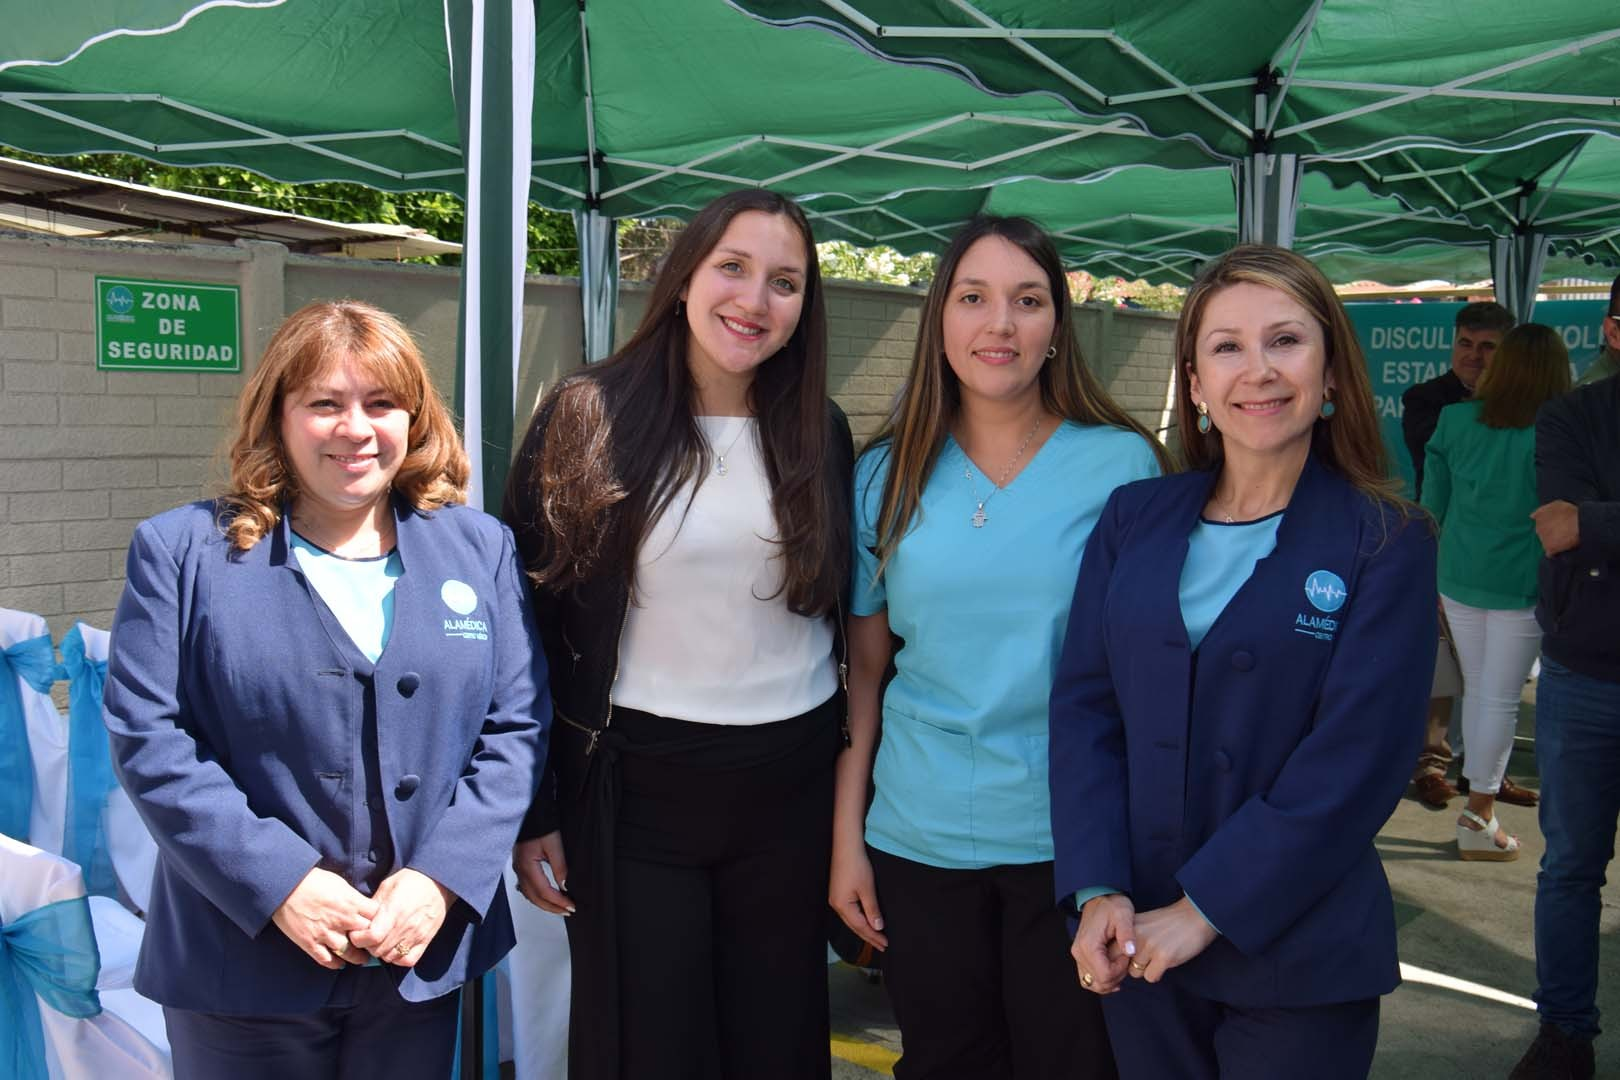 Ángela Castillo, Camila Bustos, Belén González y Lorena Martínez